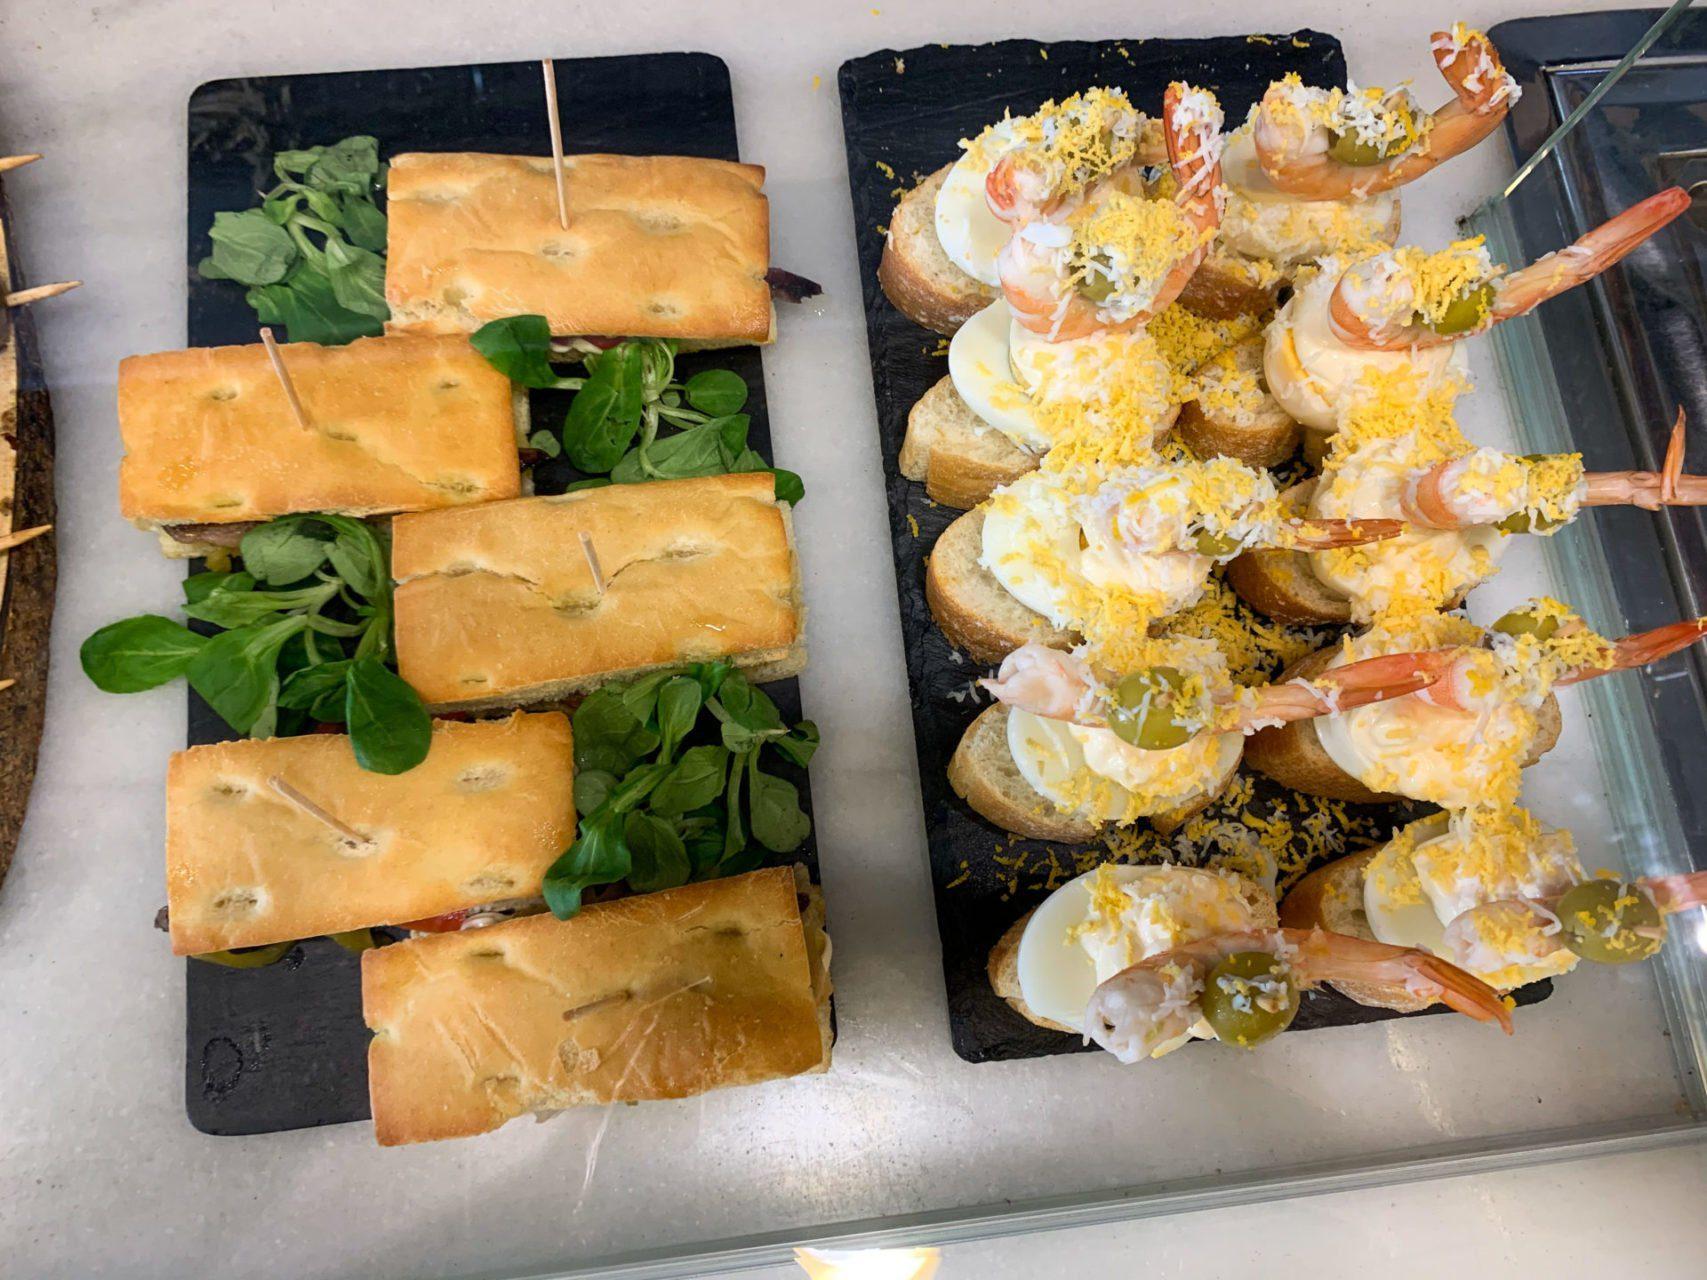 Pintxos – Culinaire hoogstandjes in Baskenland